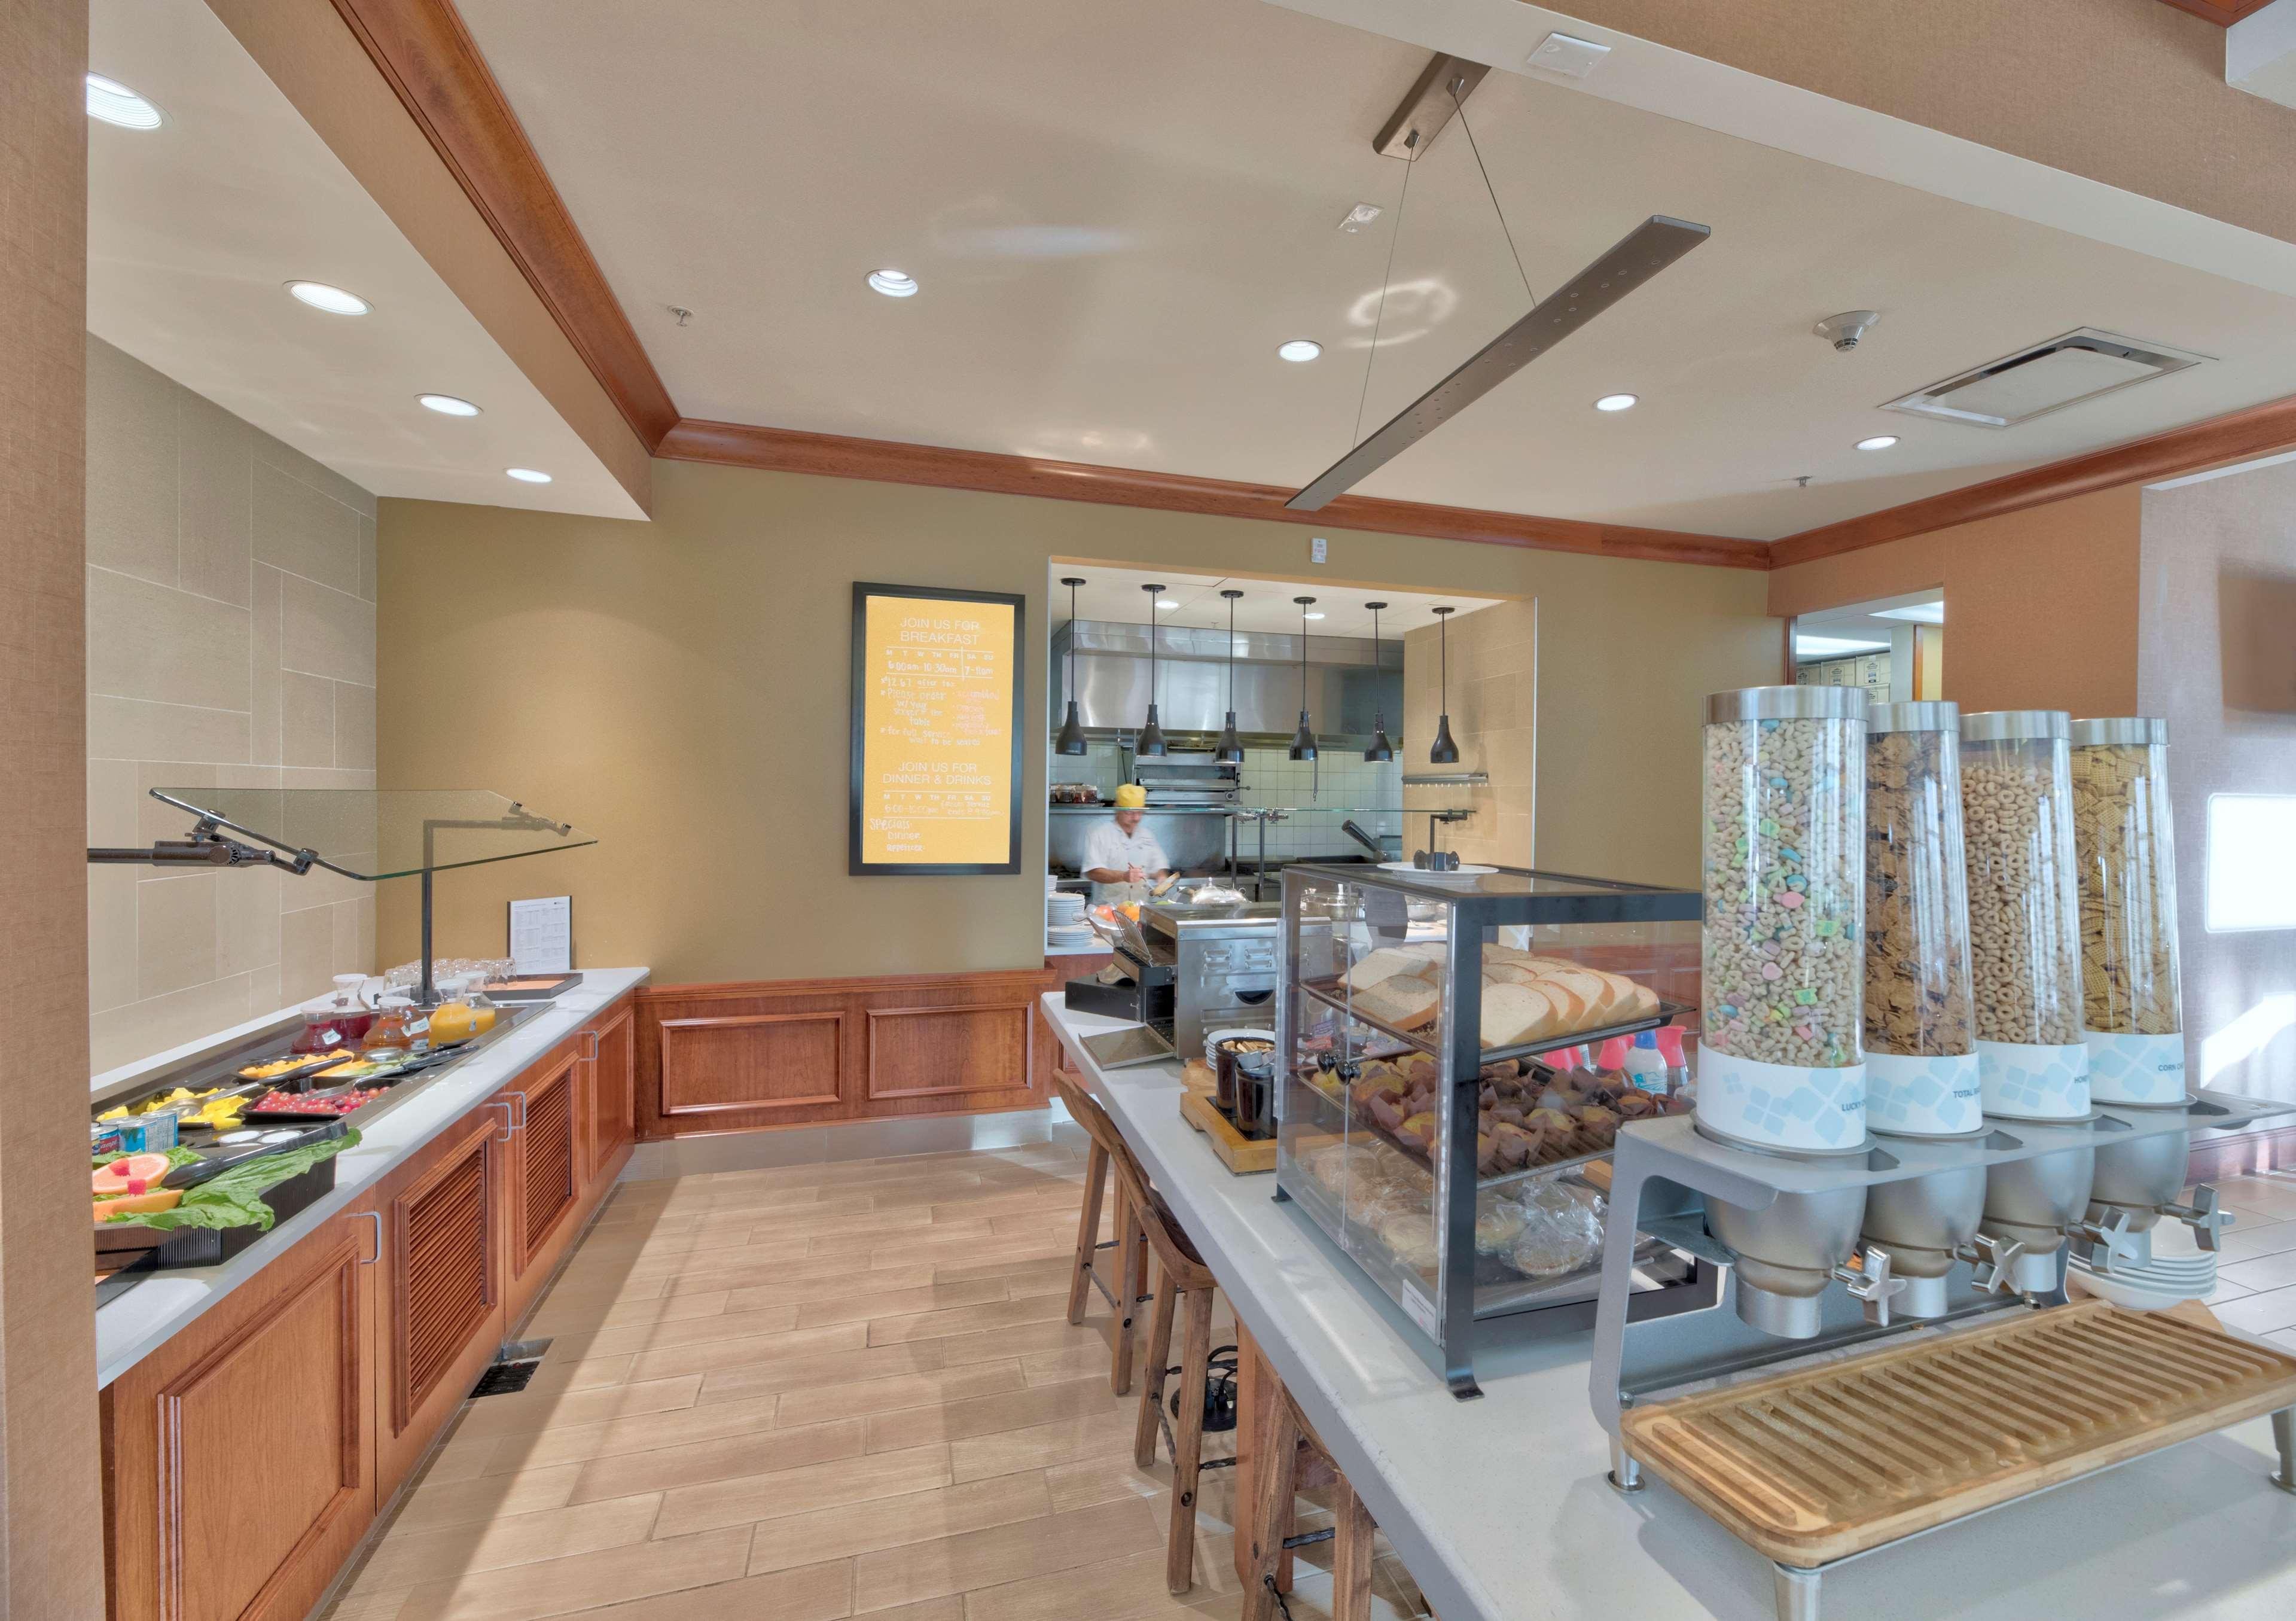 Hilton Garden Inn Laramie image 9